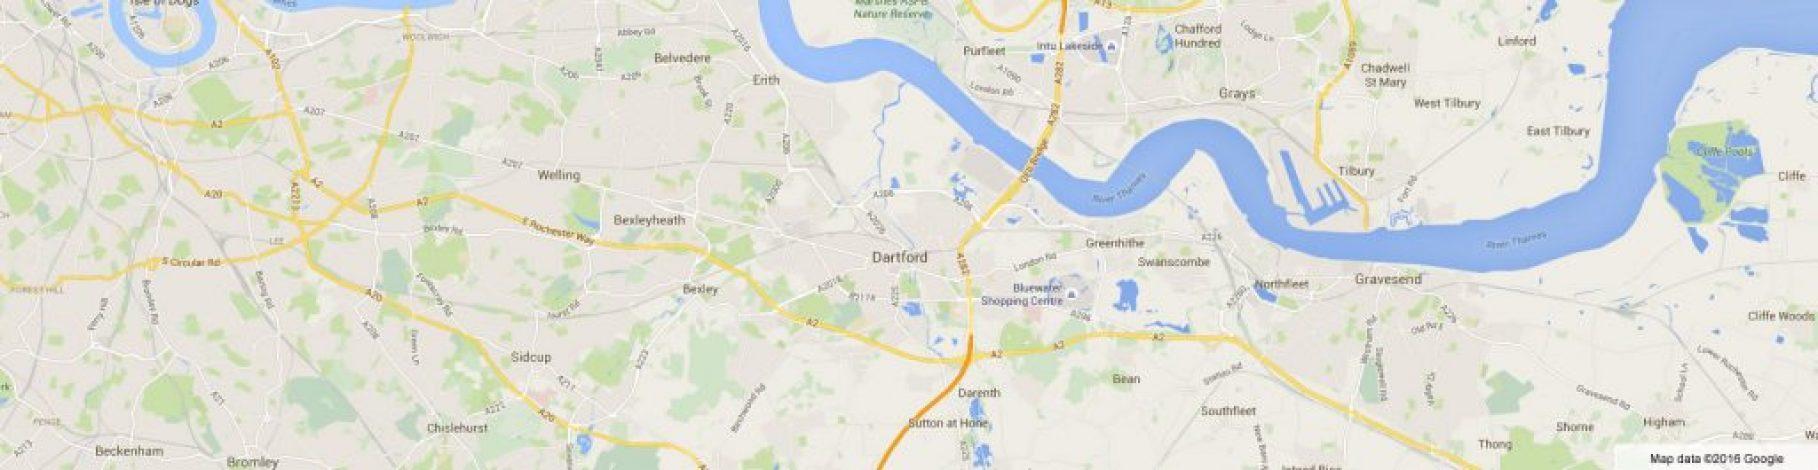 Dartford Map